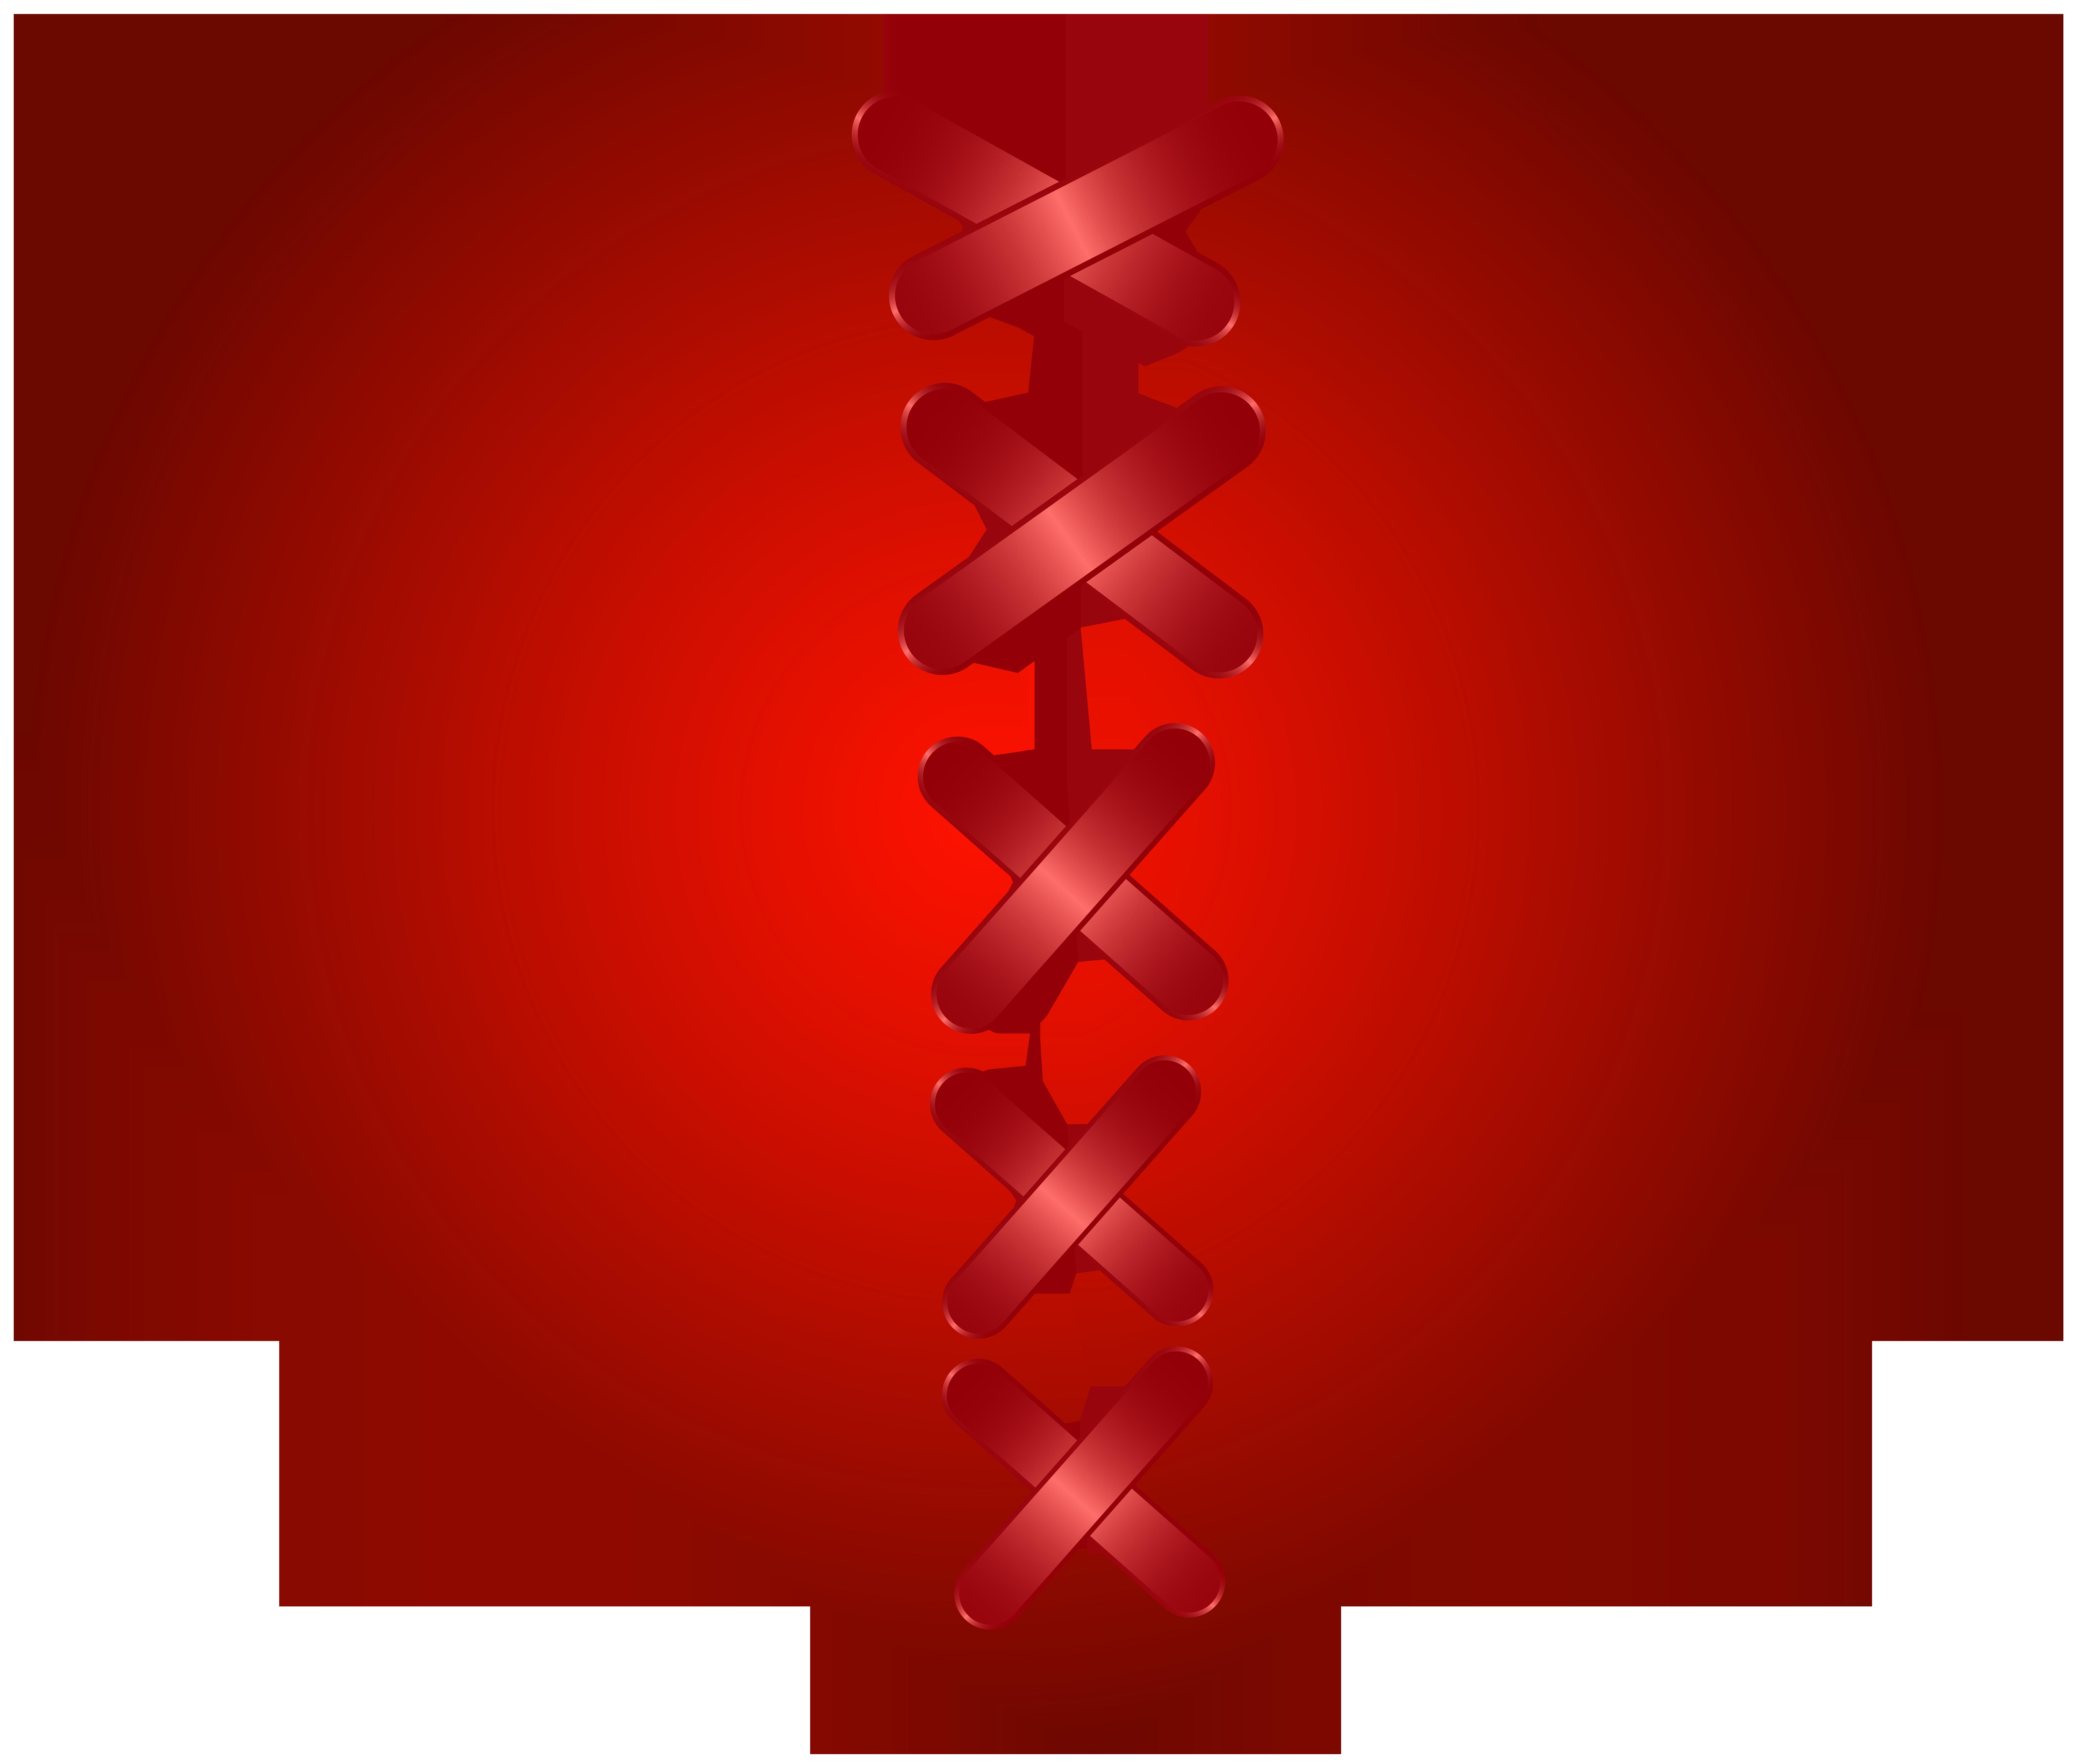 Piano clipart broken. Sewn heart transparent clip